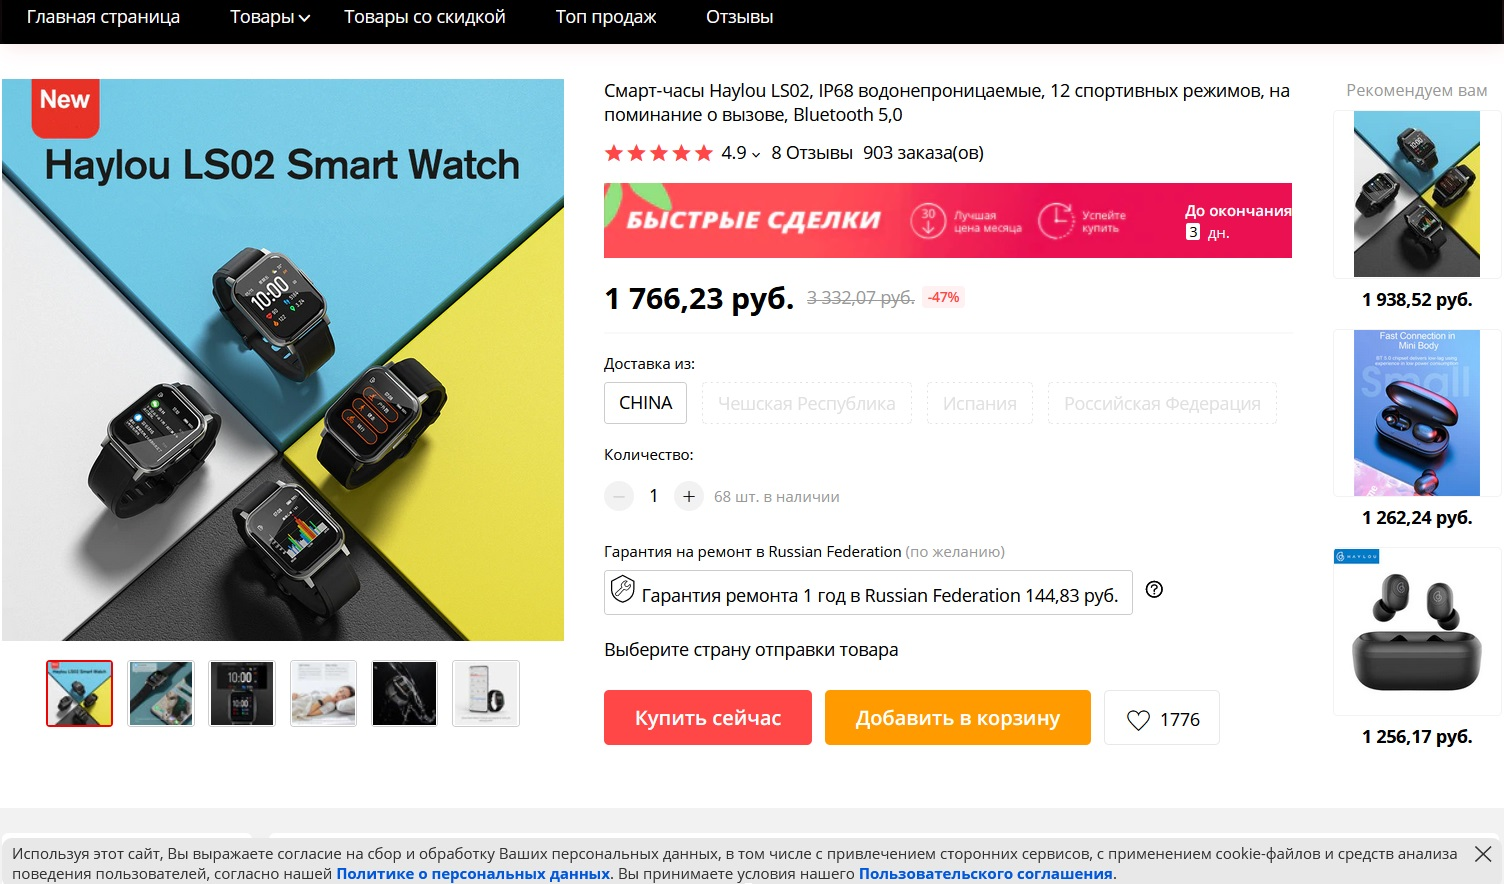 Смарт-часы Greentiger Q50/Q90/Q528